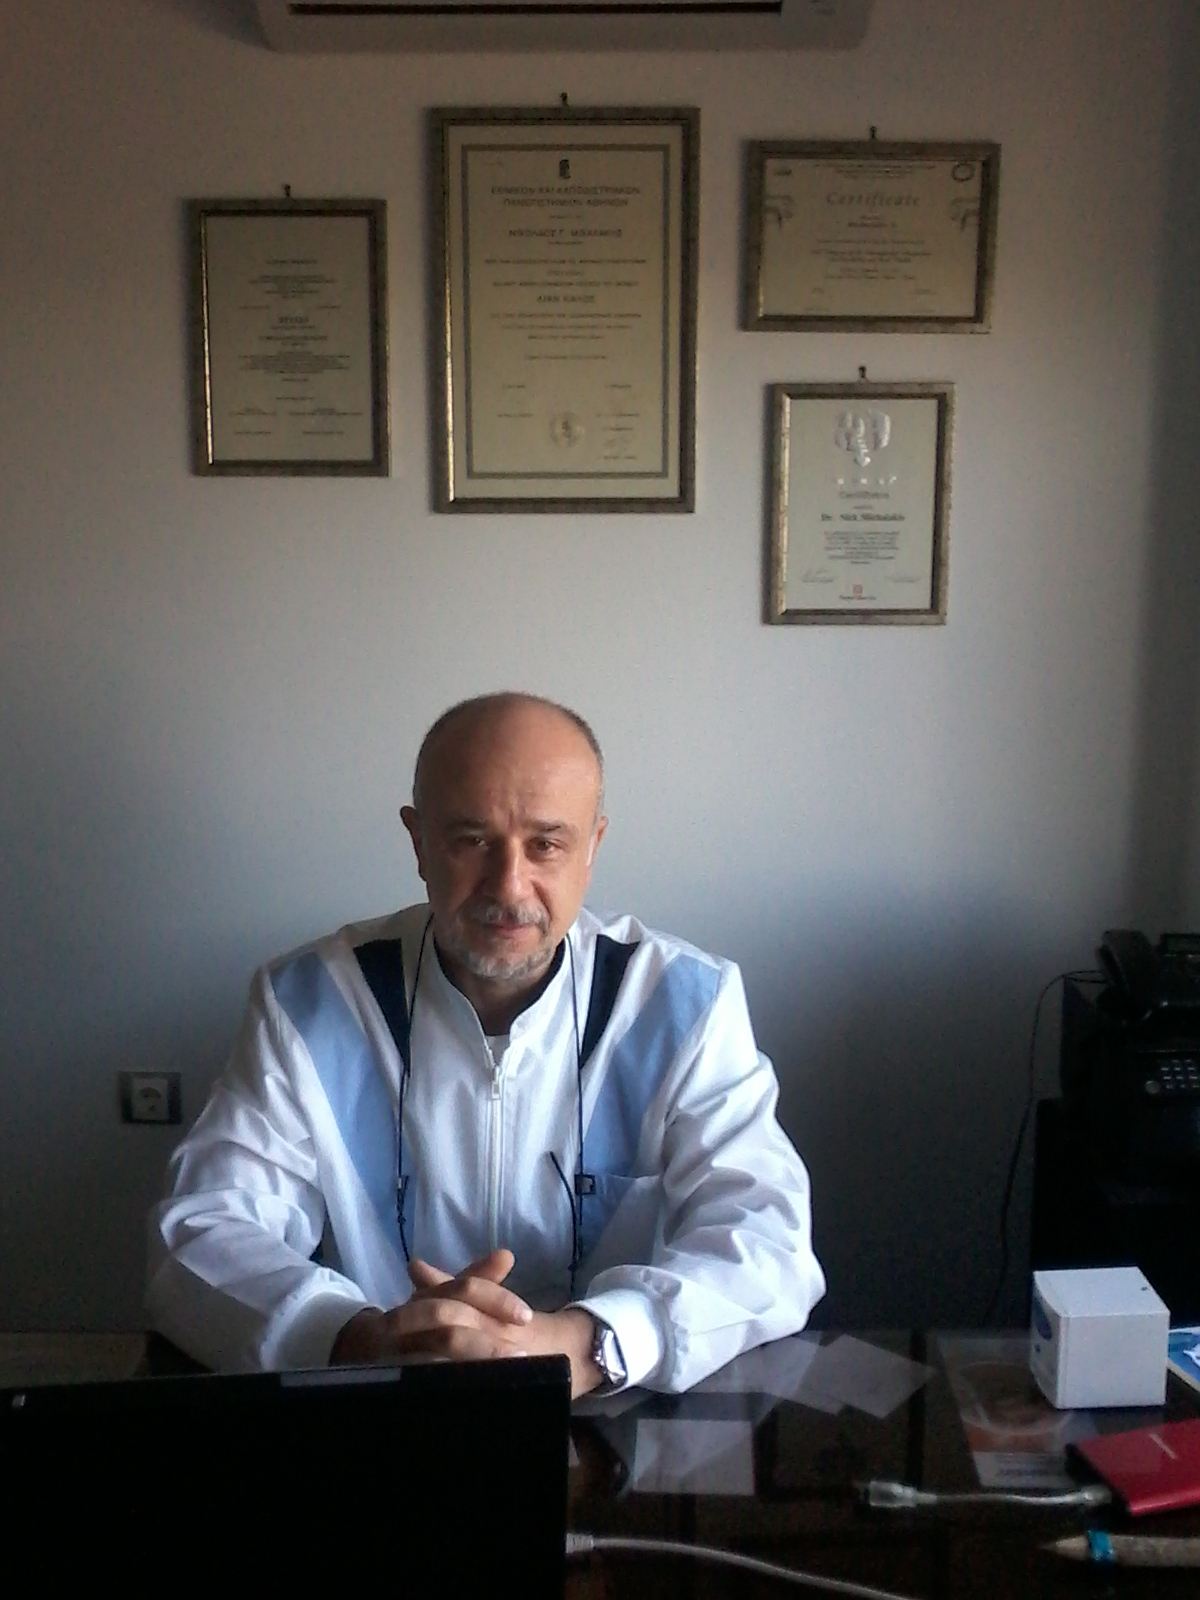 nikolaos michalakis thesis Michalakis nikolaos – civil engineering: technical office ausbildung: delft university of technology 68 kontakte sehen sie sich panagiotis vasarmidis.